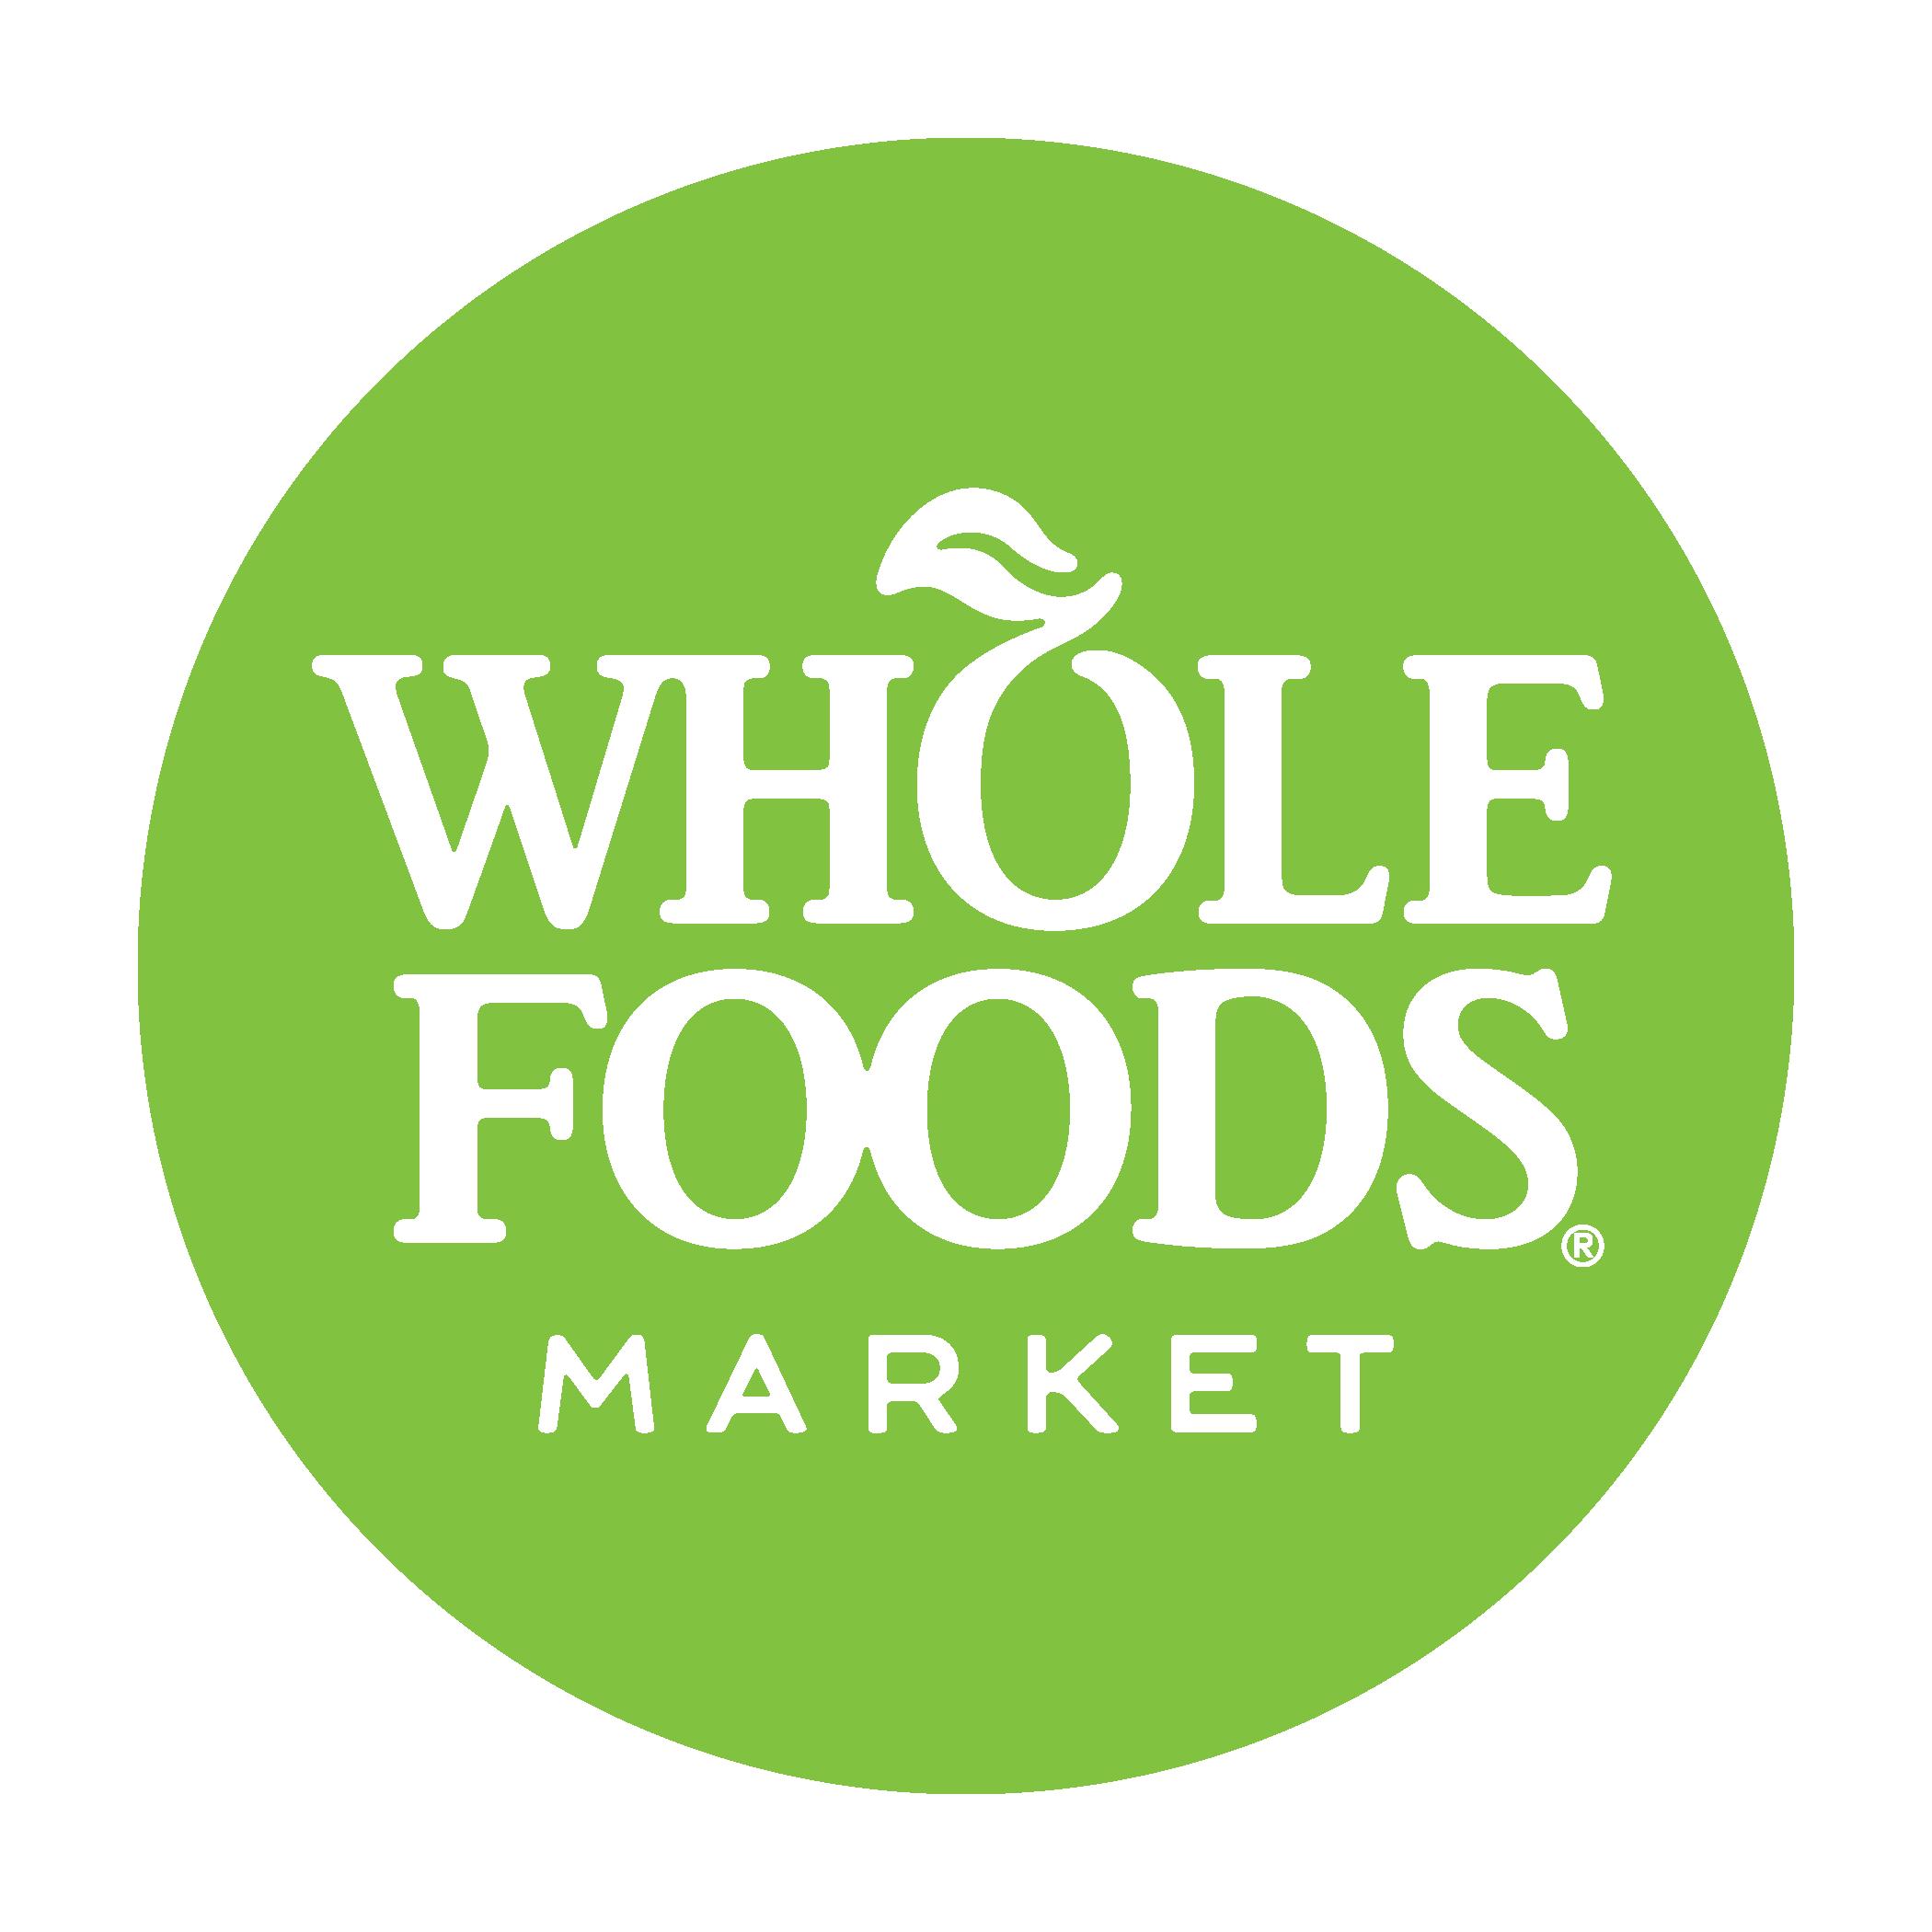 Whole Foods Market Logo Png Image Whole Foods Market Food Logo Design Whole Food Recipes